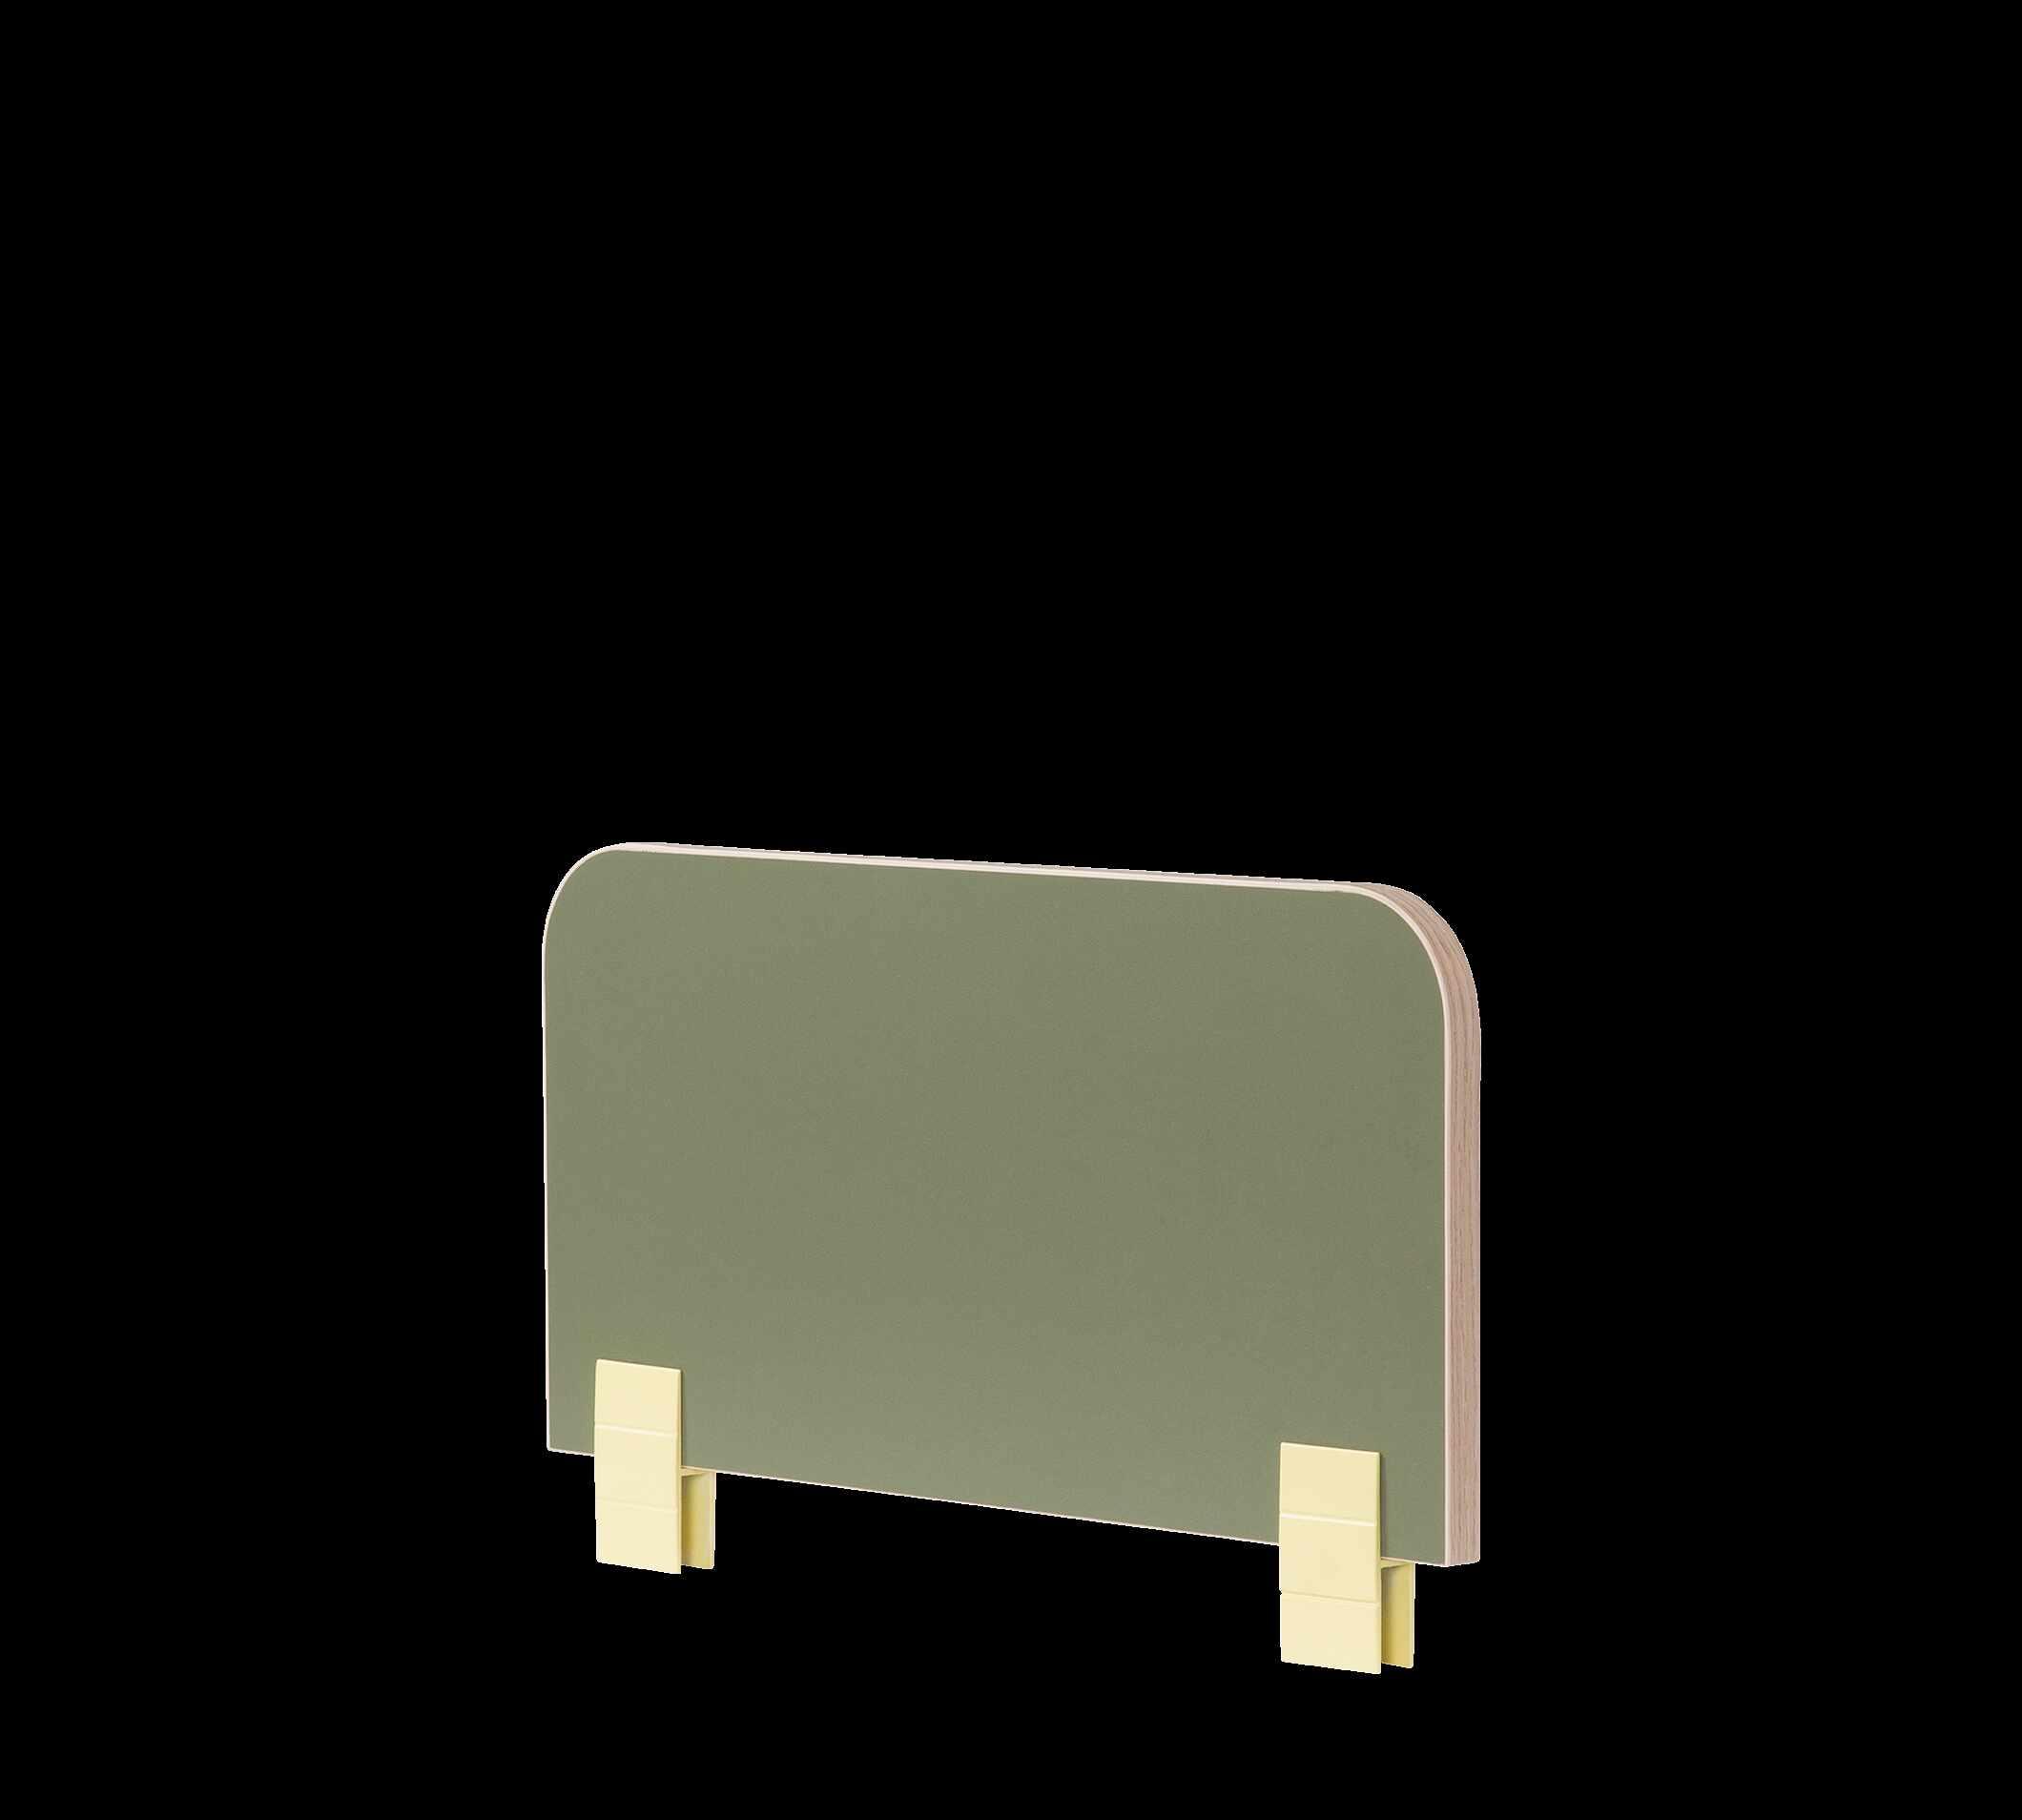 Protectie din pal pentru pat copii Montessori Verde, l50xA2xH29 cm la pret 155 lei